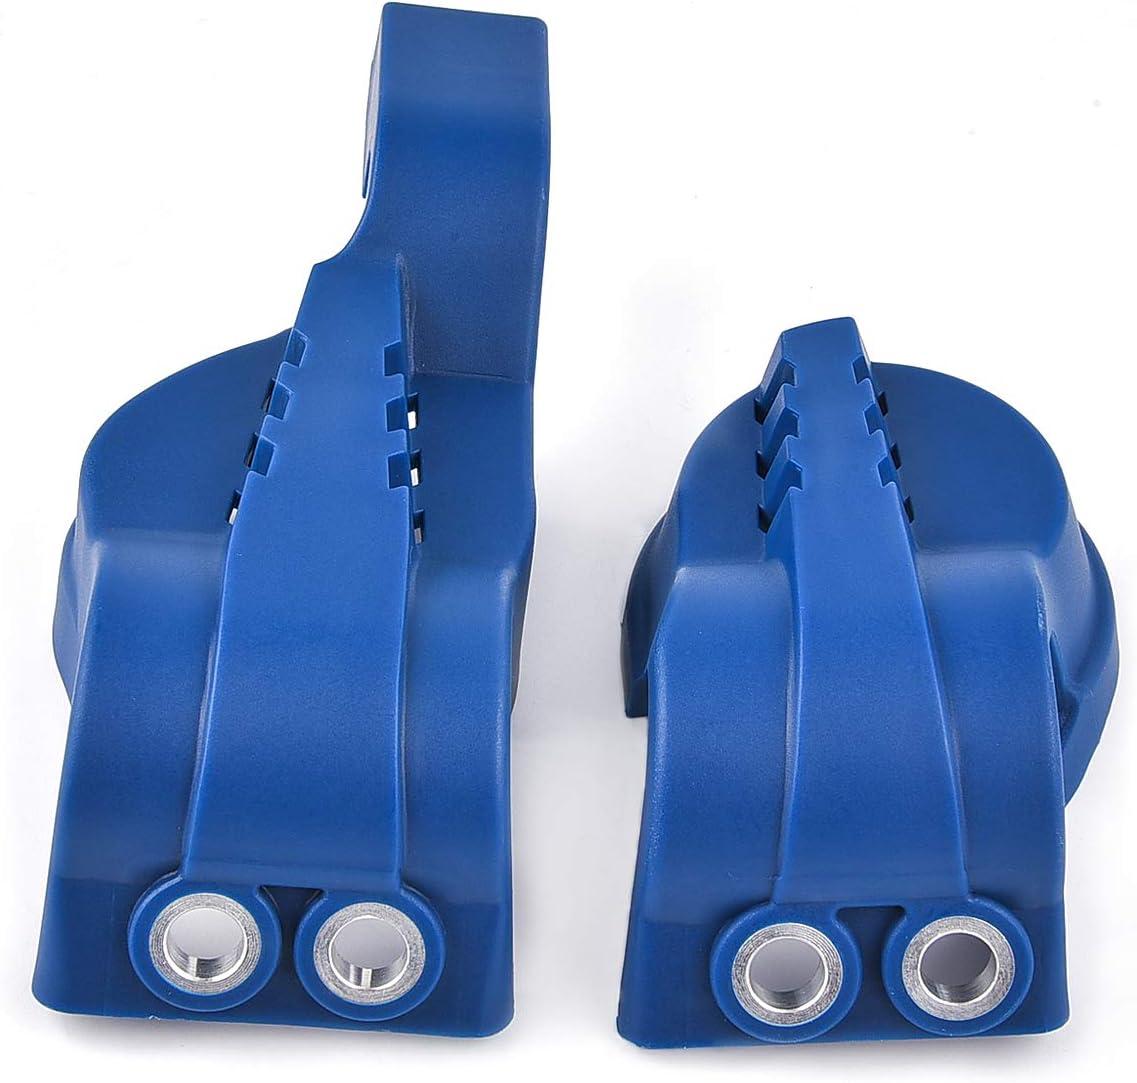 WP Kit de protector para zapatos de horquilla de repuesto para FE FC TE TC 125 250 300 350 EXC Motocross Dirt Pit Bike azul